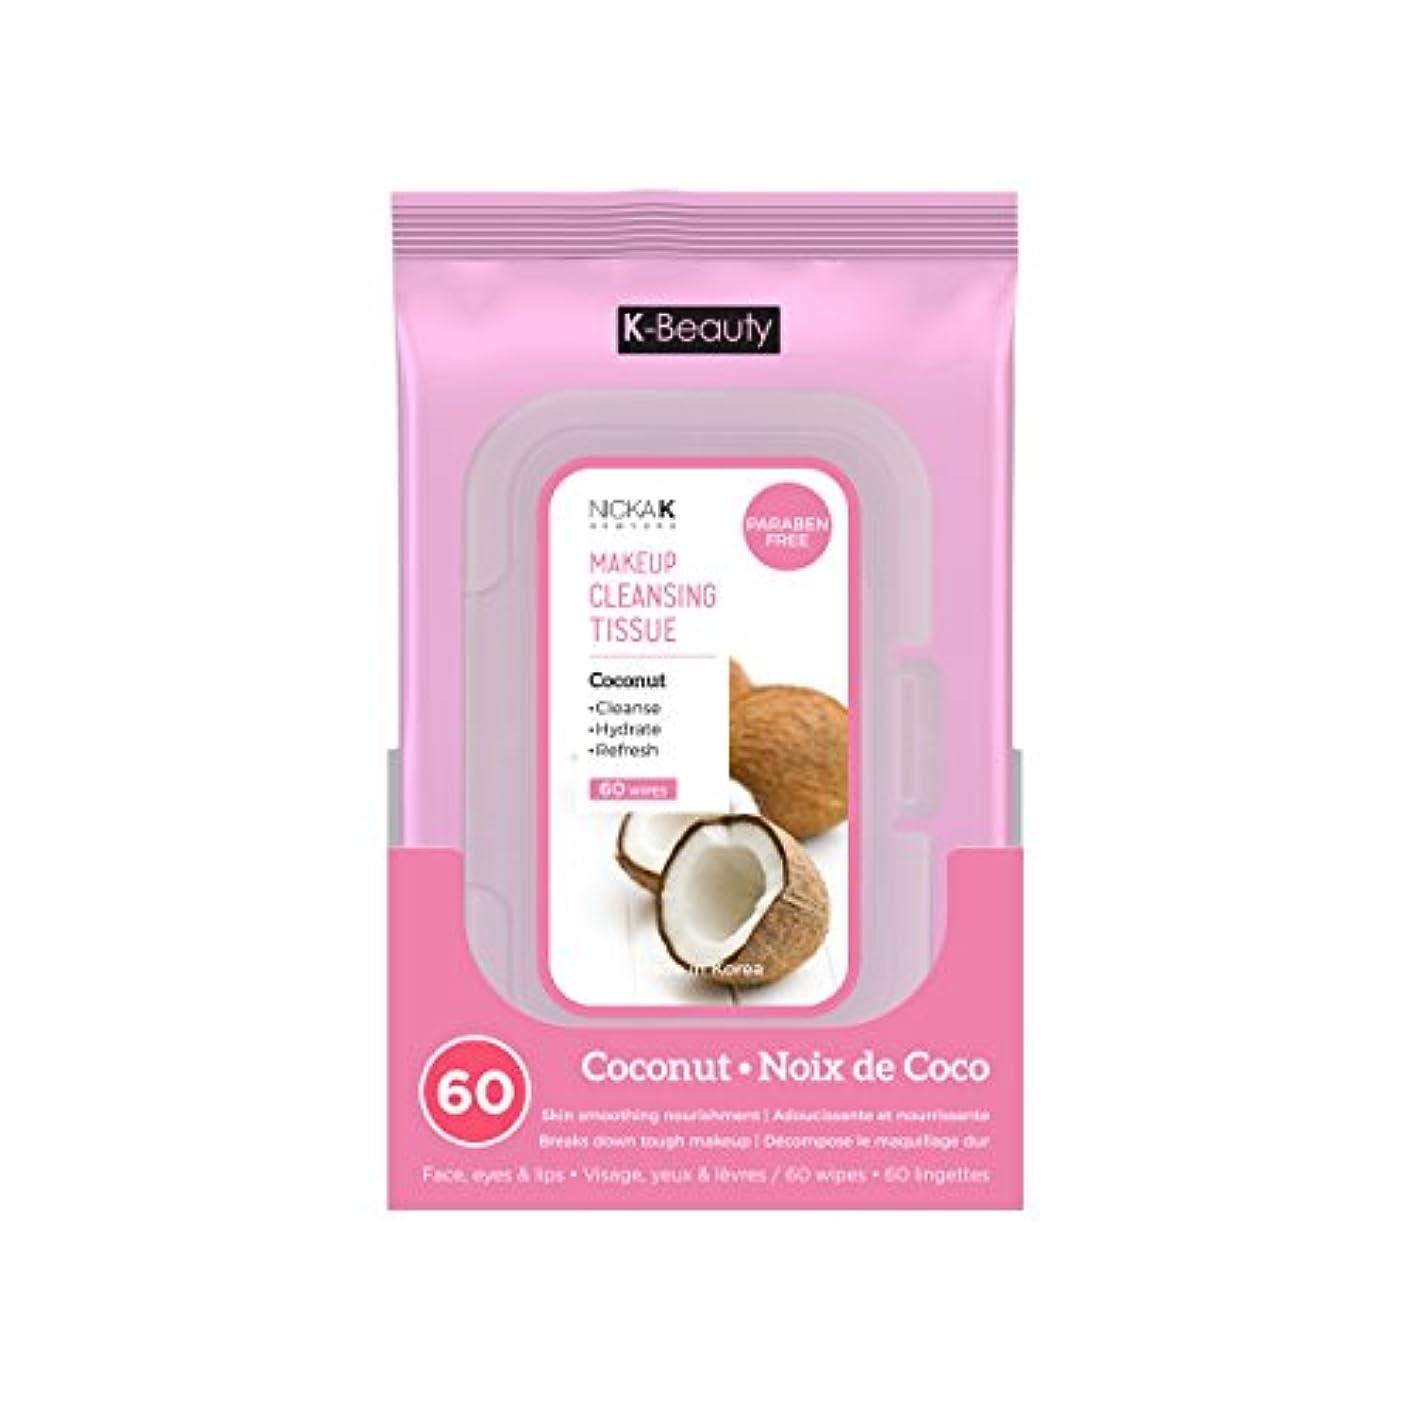 NICKA K Make Up Cleansing Tissue - Coconut (並行輸入品)